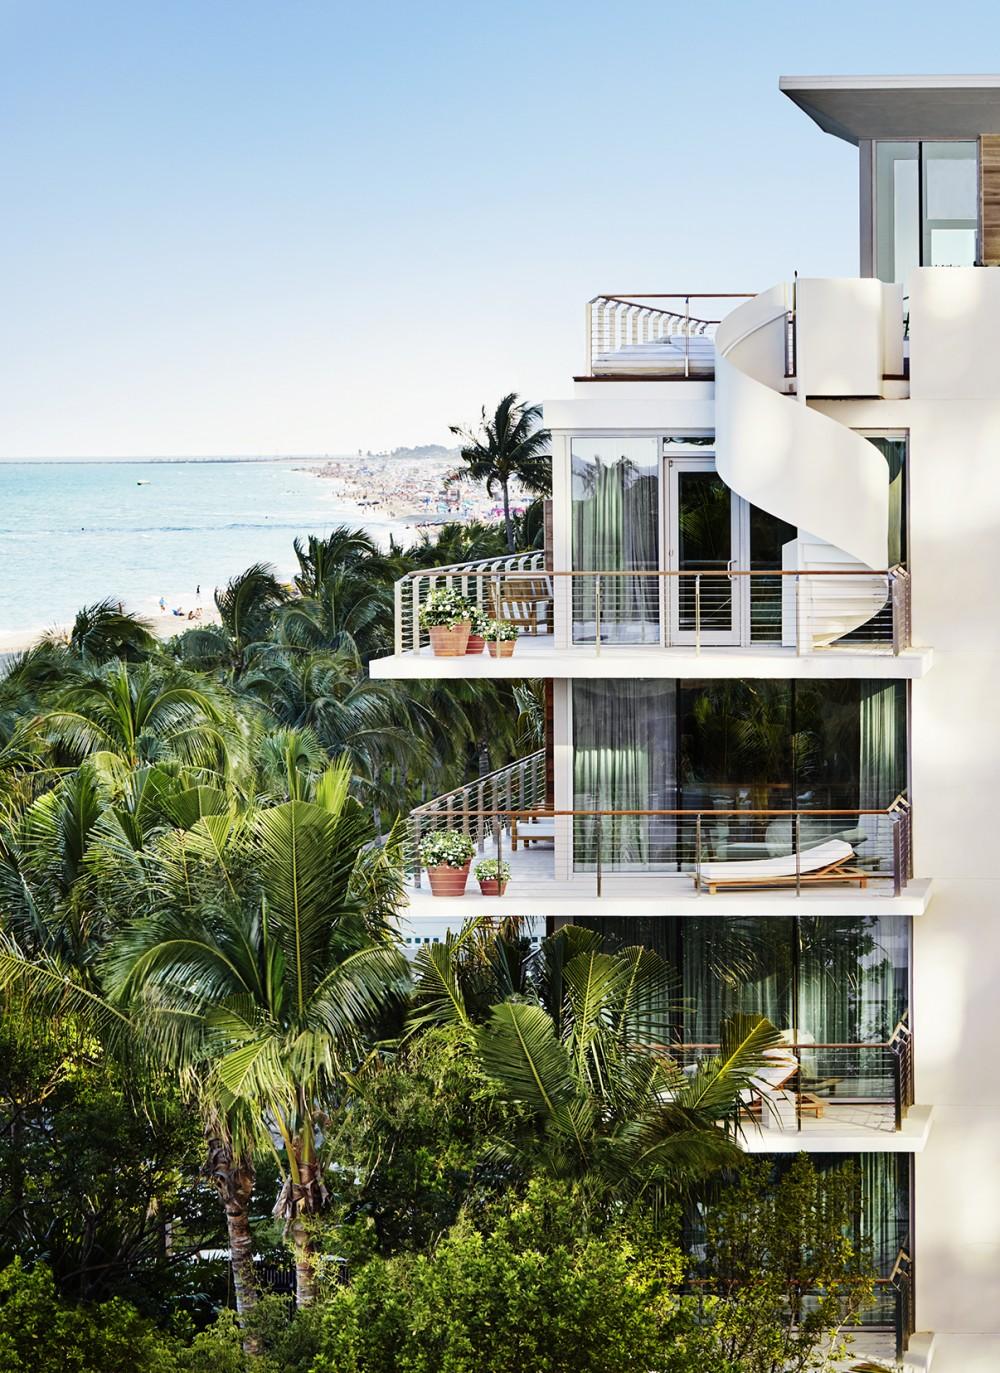 Design Hotel Find Miami Beach Edition Melting Butter